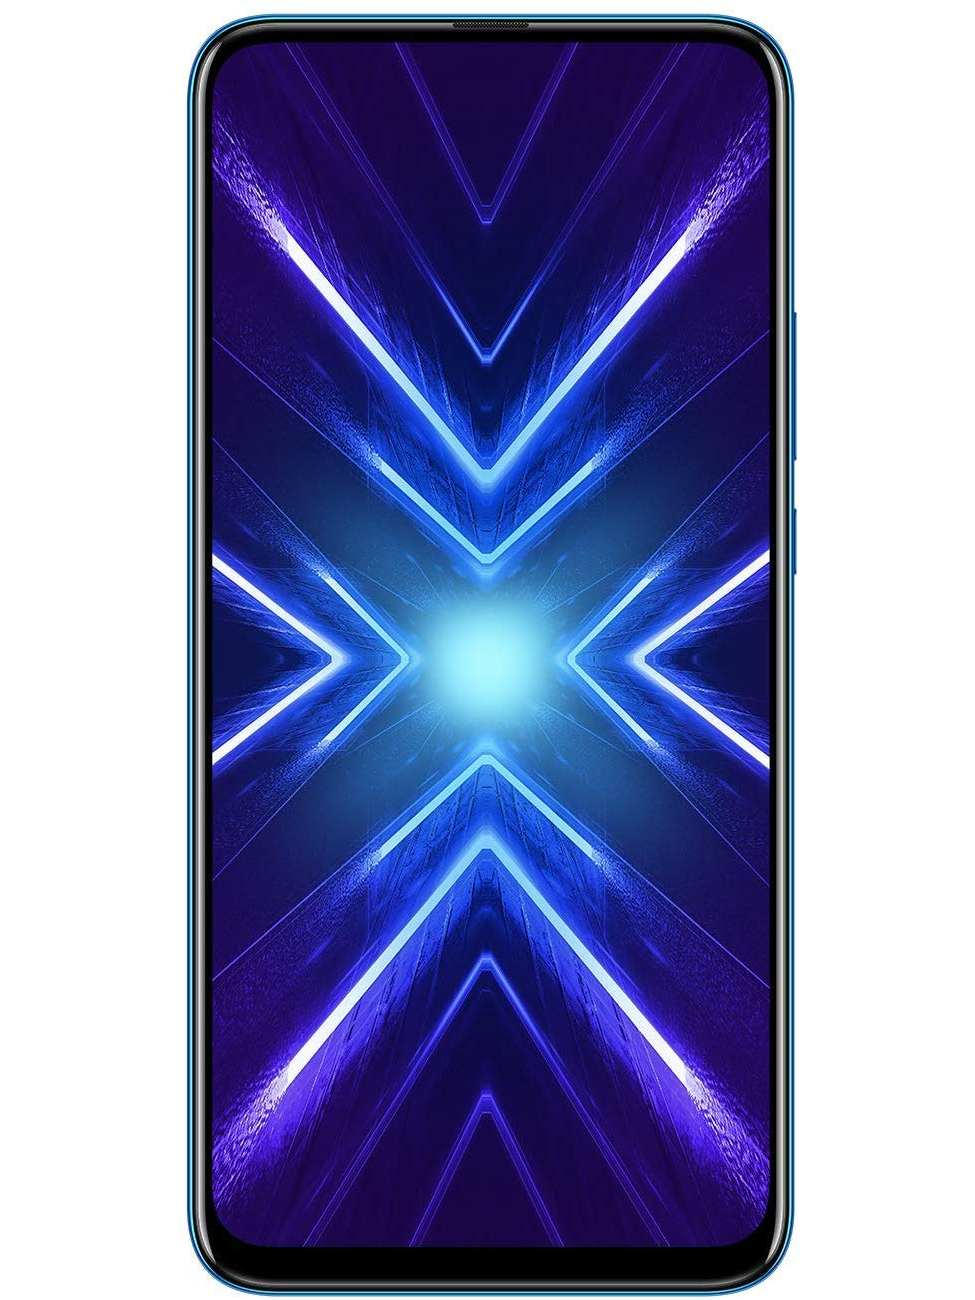 Phone Huawei Honor 9x, Blue Color (Blue), Dual Sim. 128 GB Internal Memory, 4 GB RAM Screen FullView 6,5